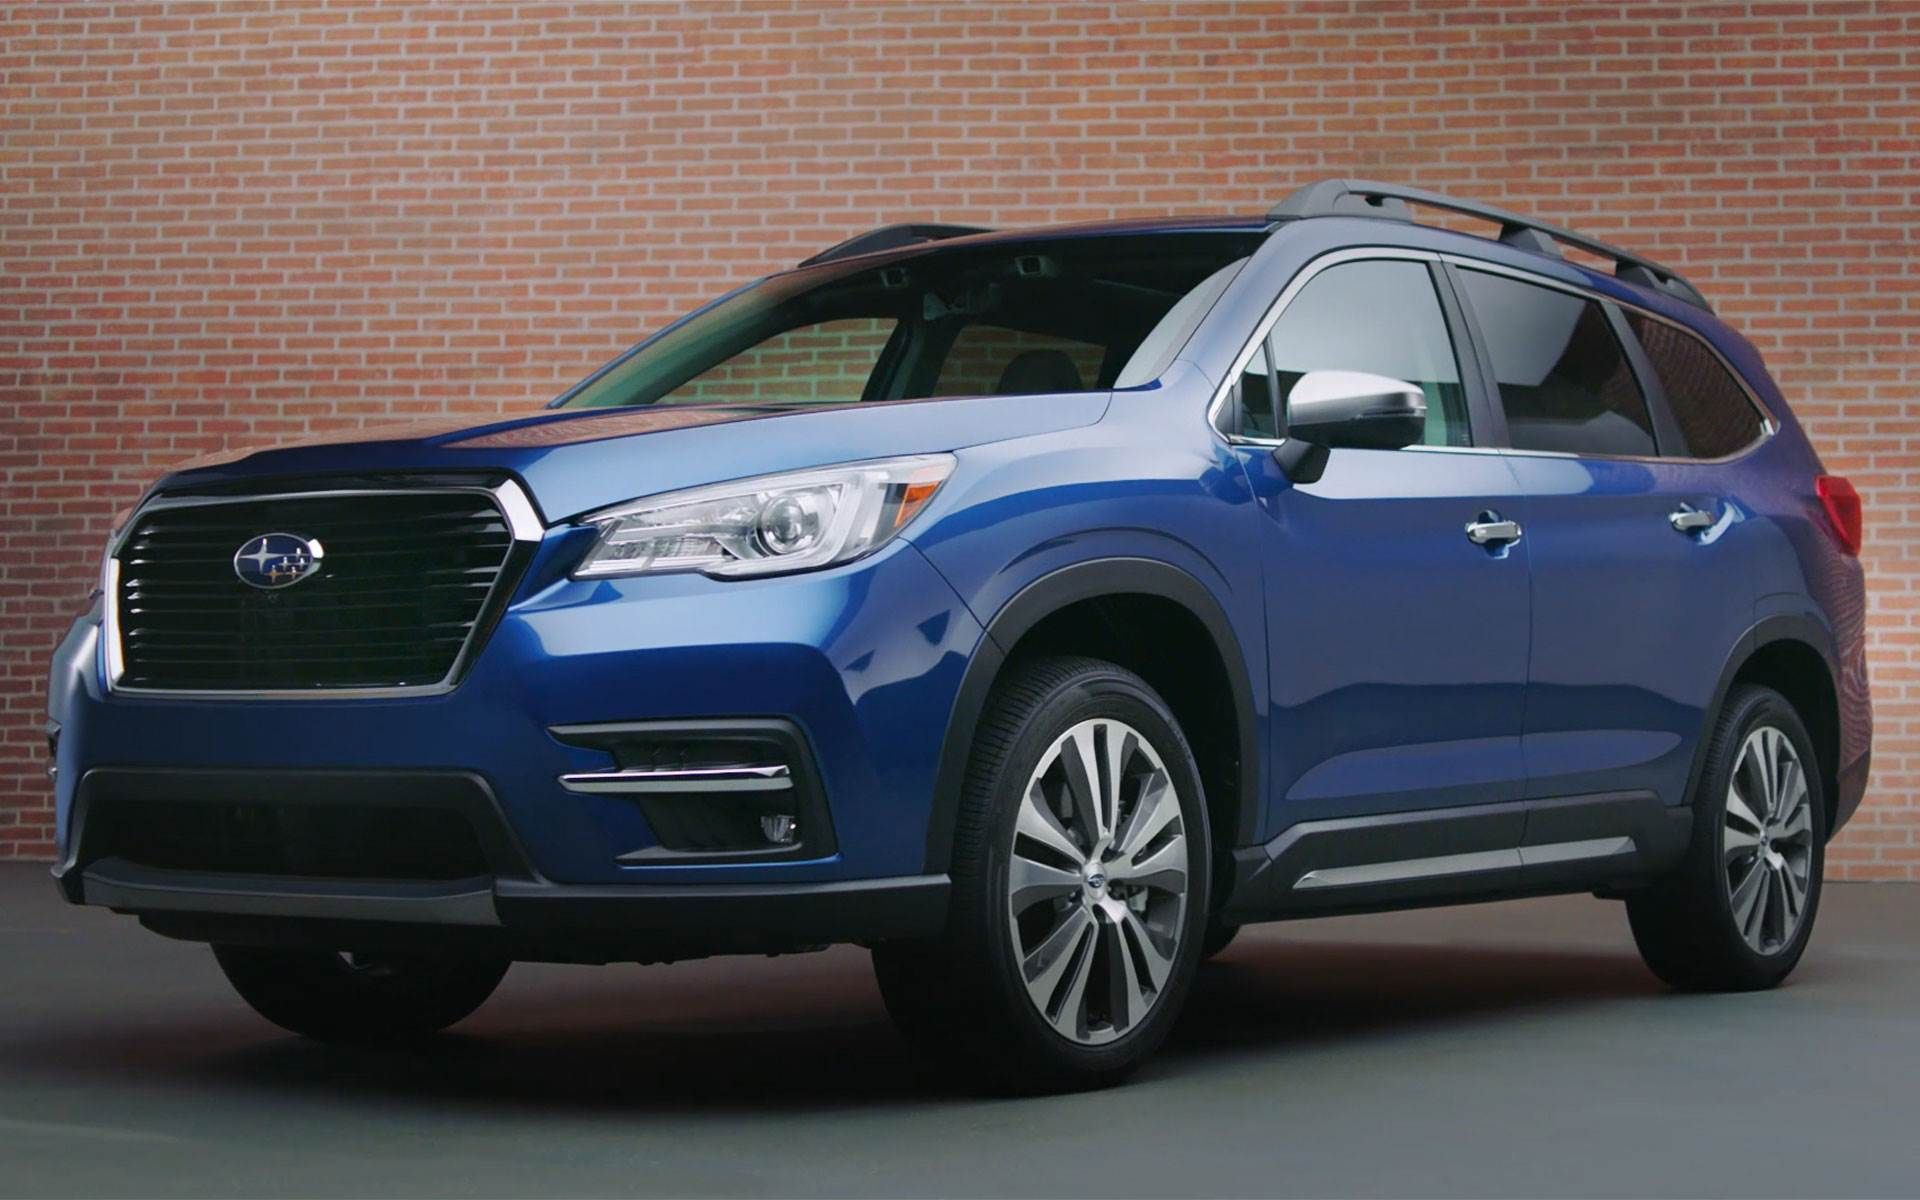 2019 Subaru Ascent Walkaround Subaru, Car, Vehicle